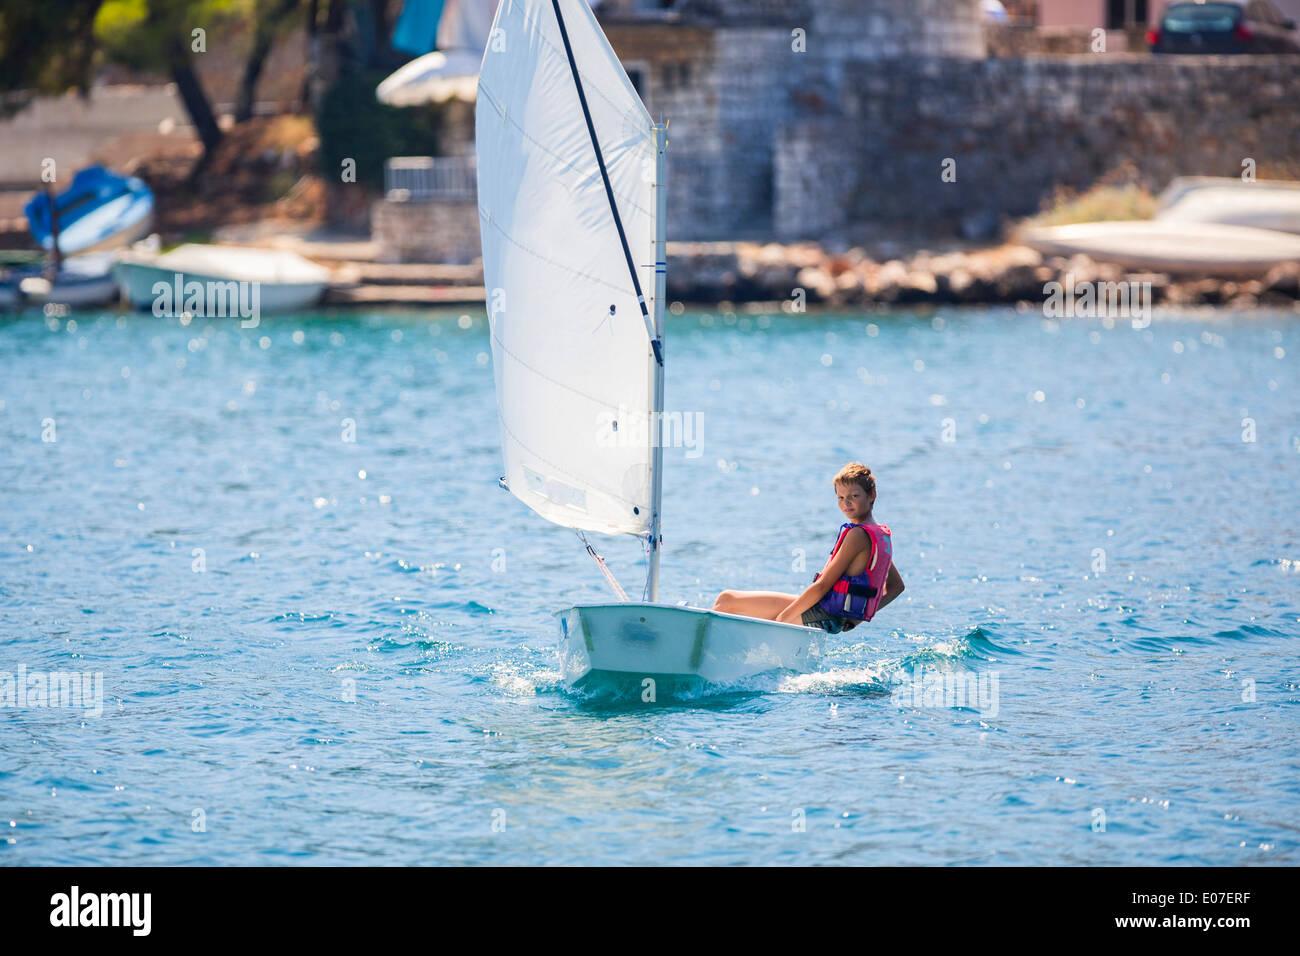 Chico en un velero, isla de Hvar, Croacia Imagen De Stock